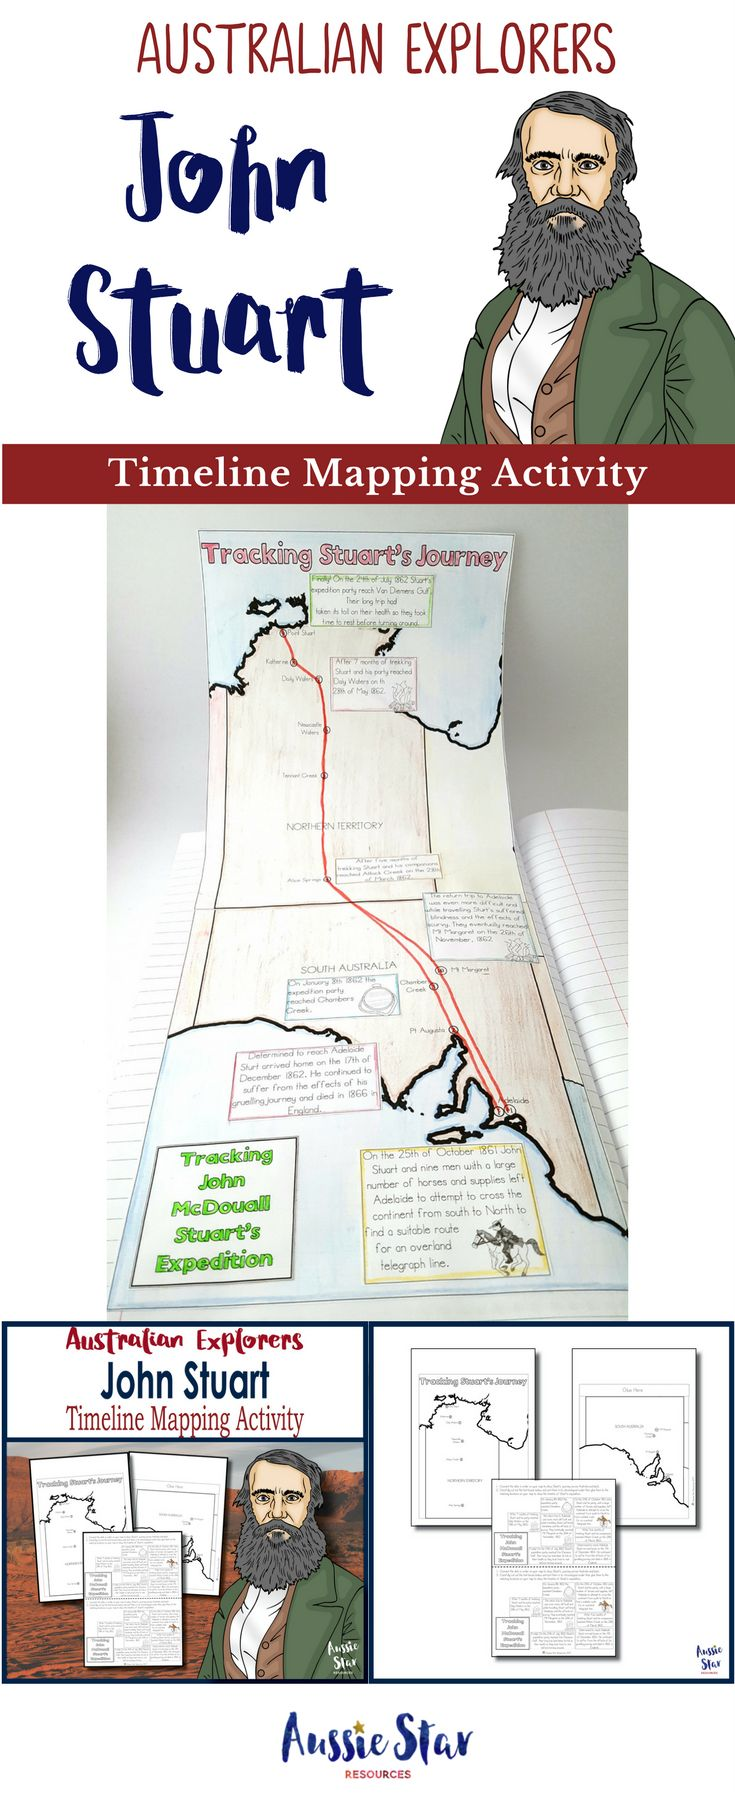 australian explorers john stuart timeline mapping activity